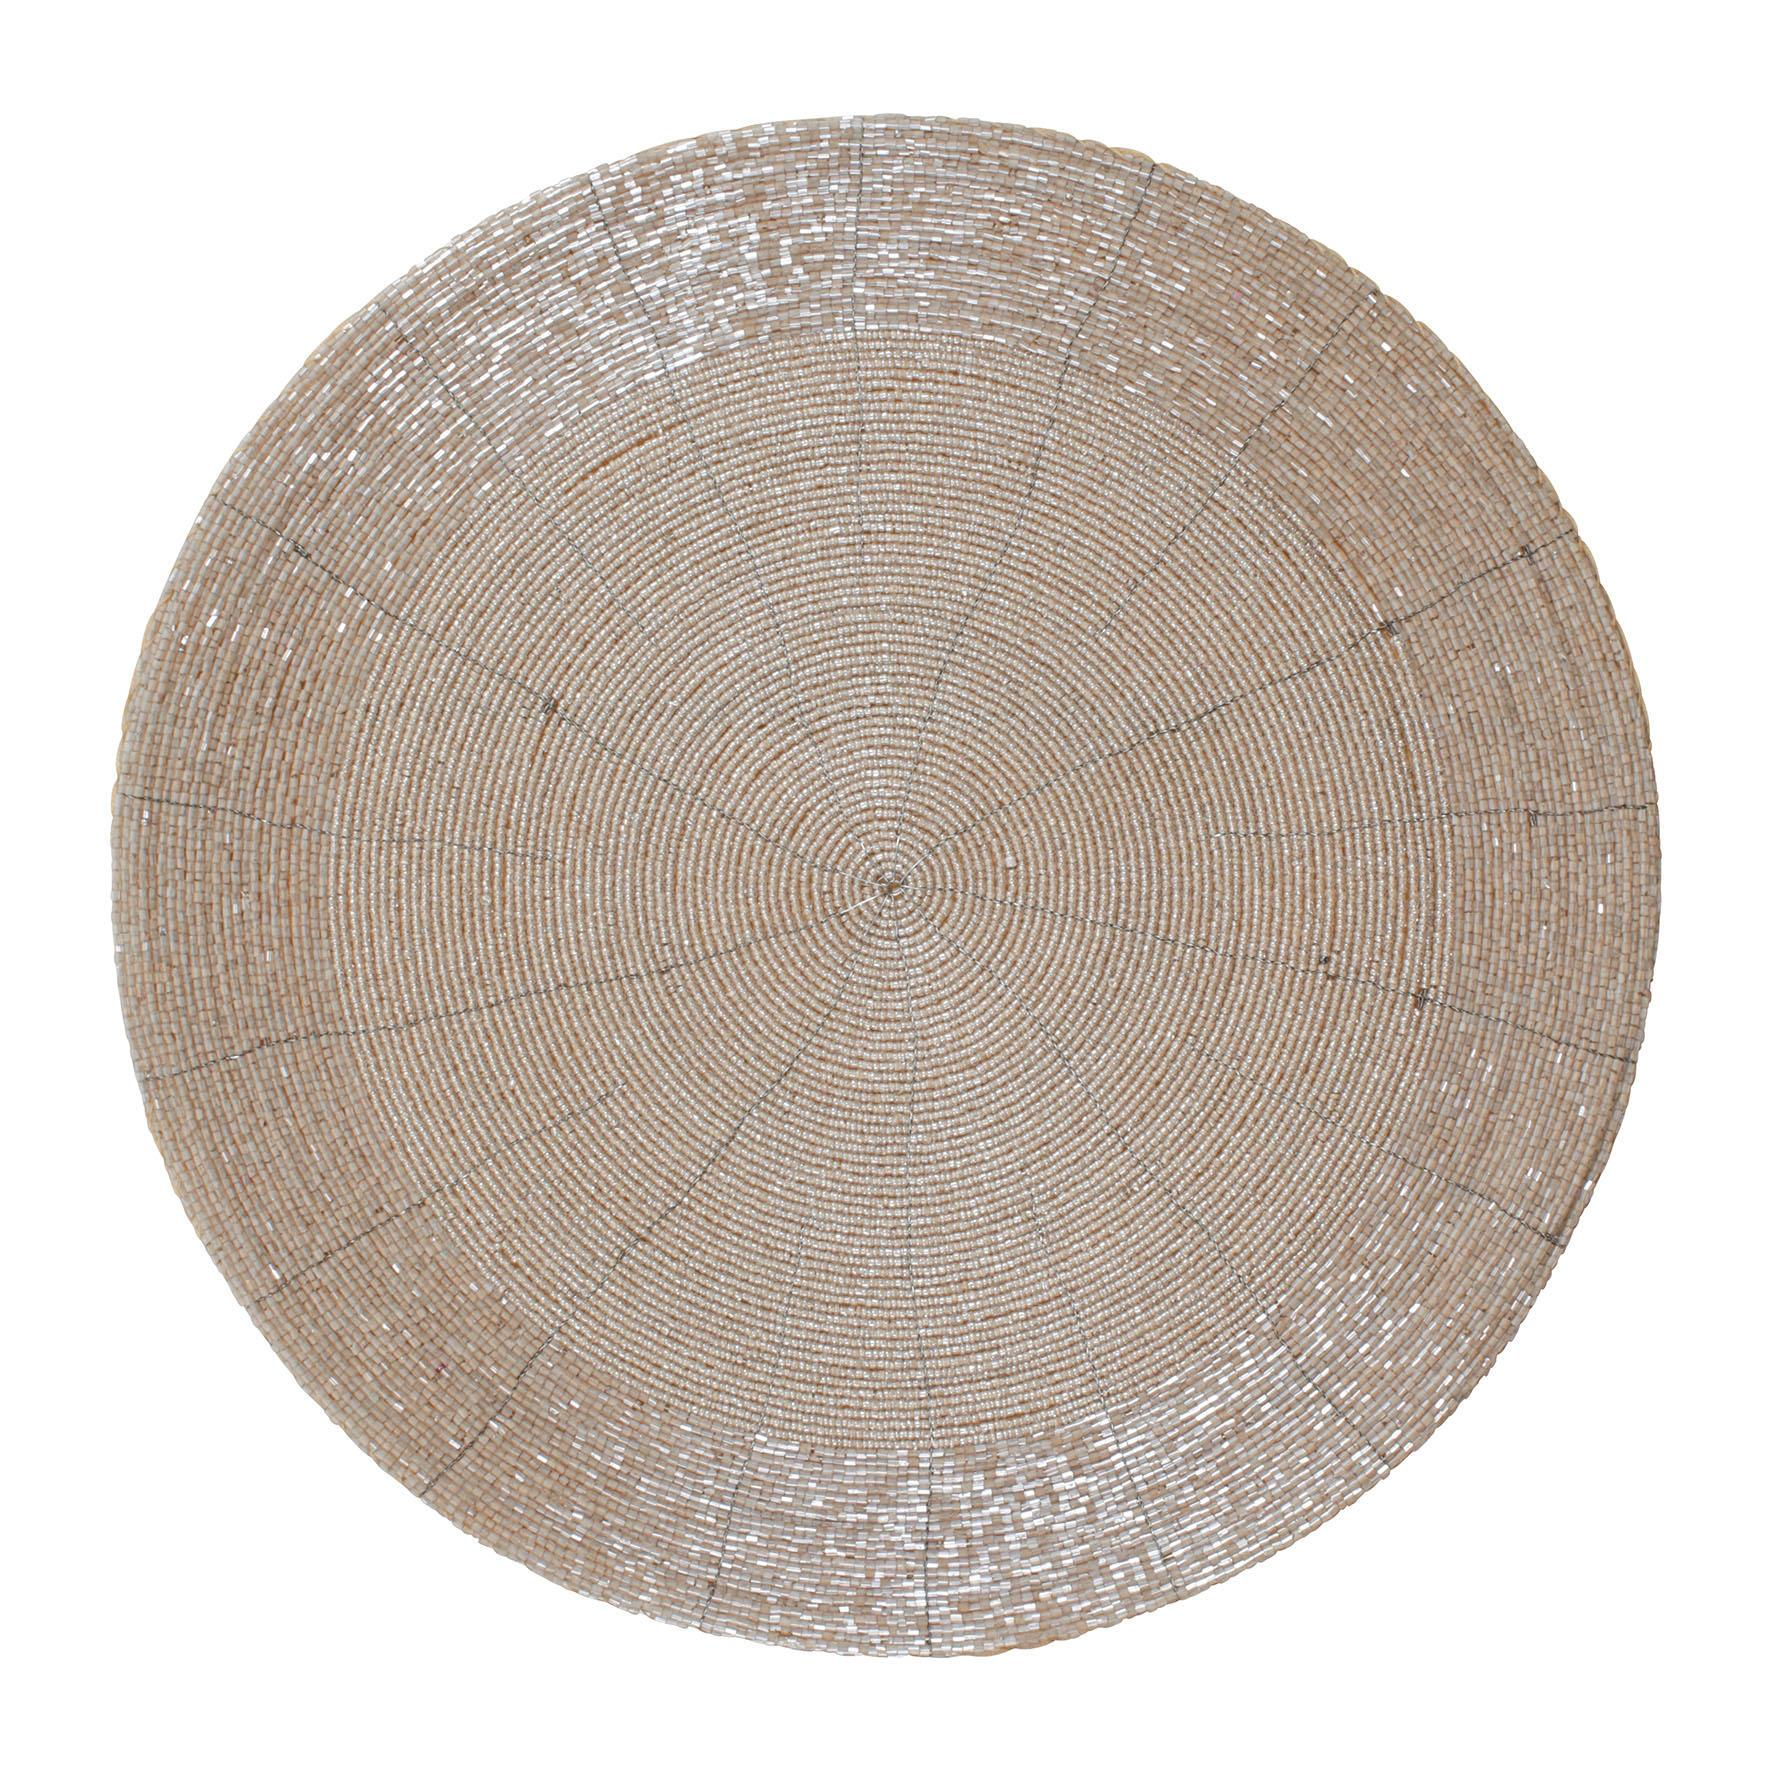 CÔTÉ TABLE Prostírání - Perles d'Argent, žlutá barva, stříbrná barva, sklo, plast, textil